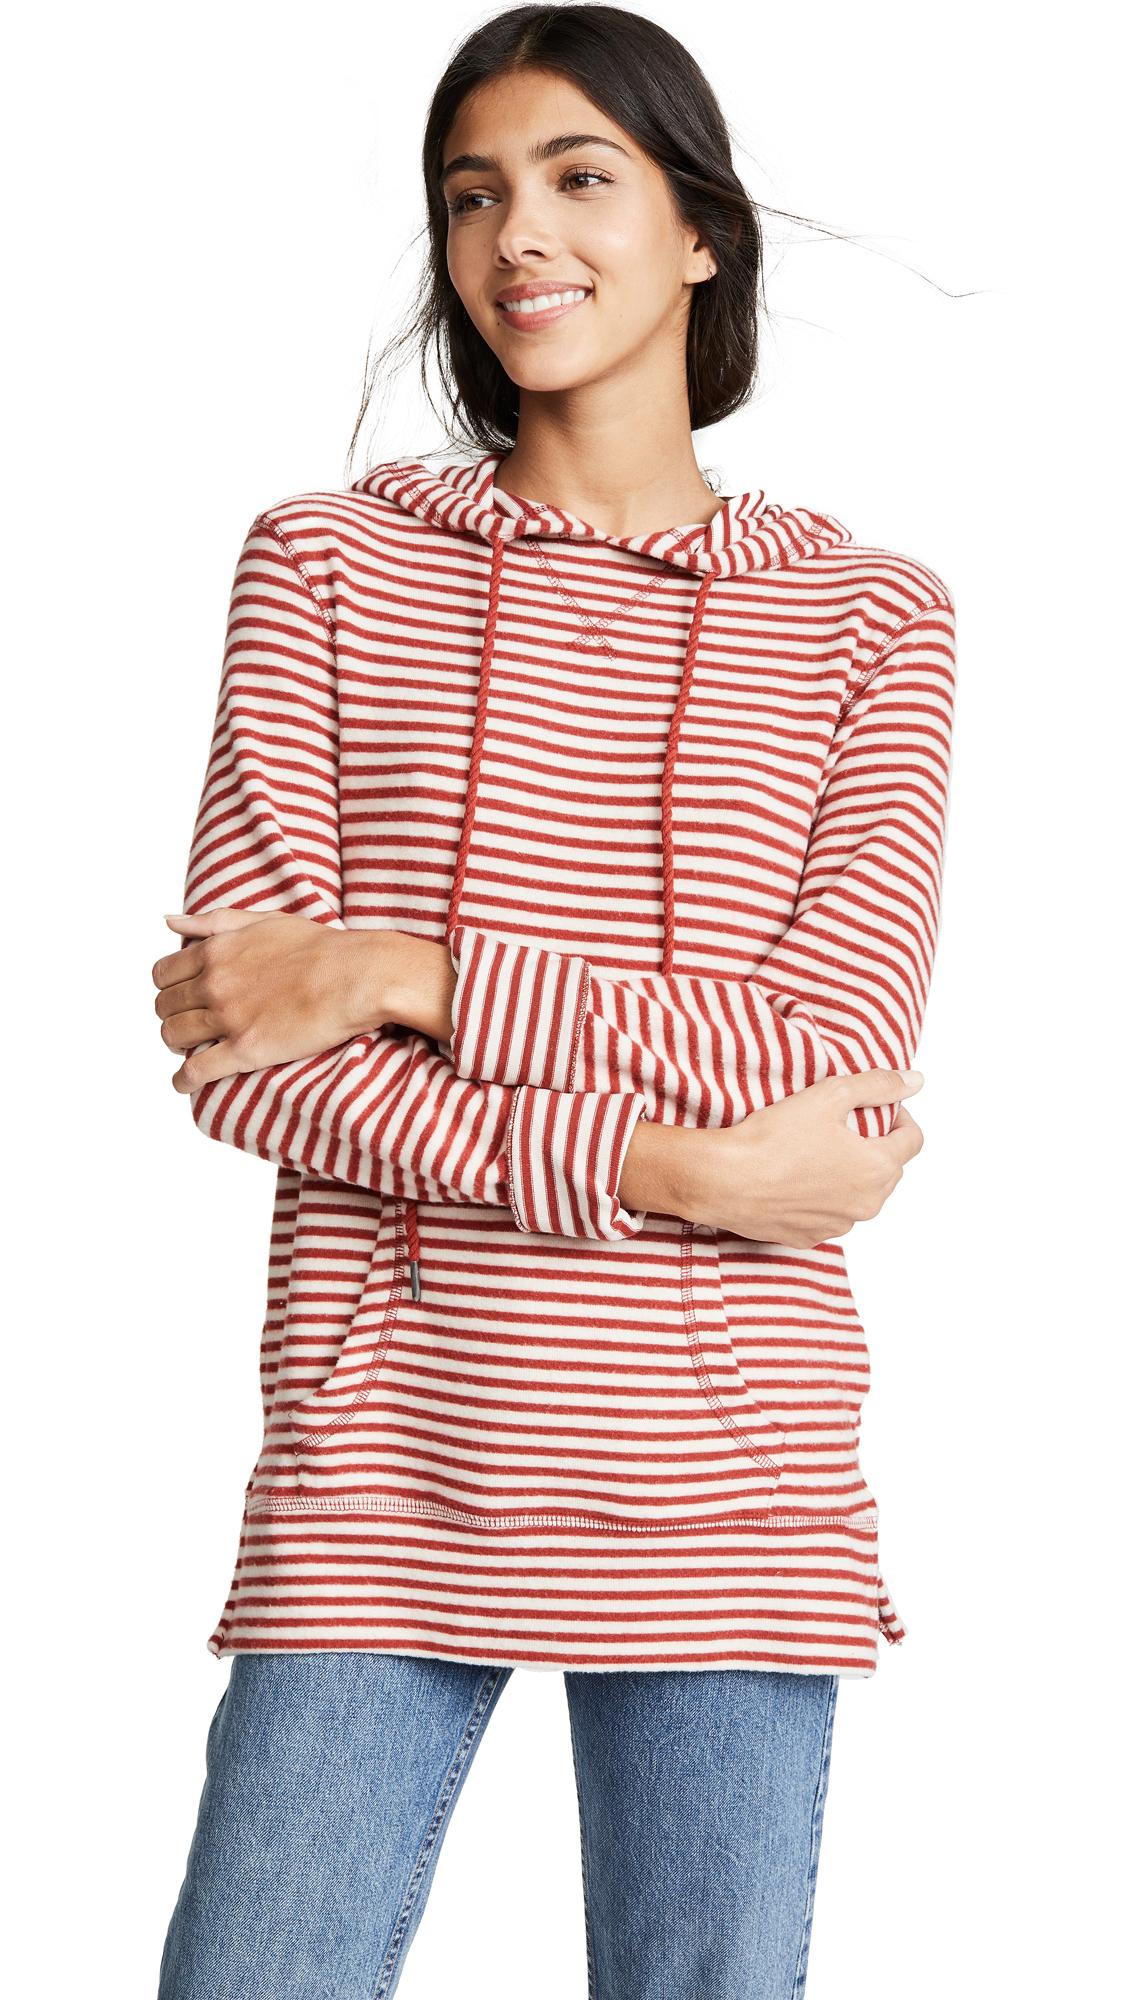 Z Supply Stripe Soft Spun Pullover In Sandshell/Russet Henna